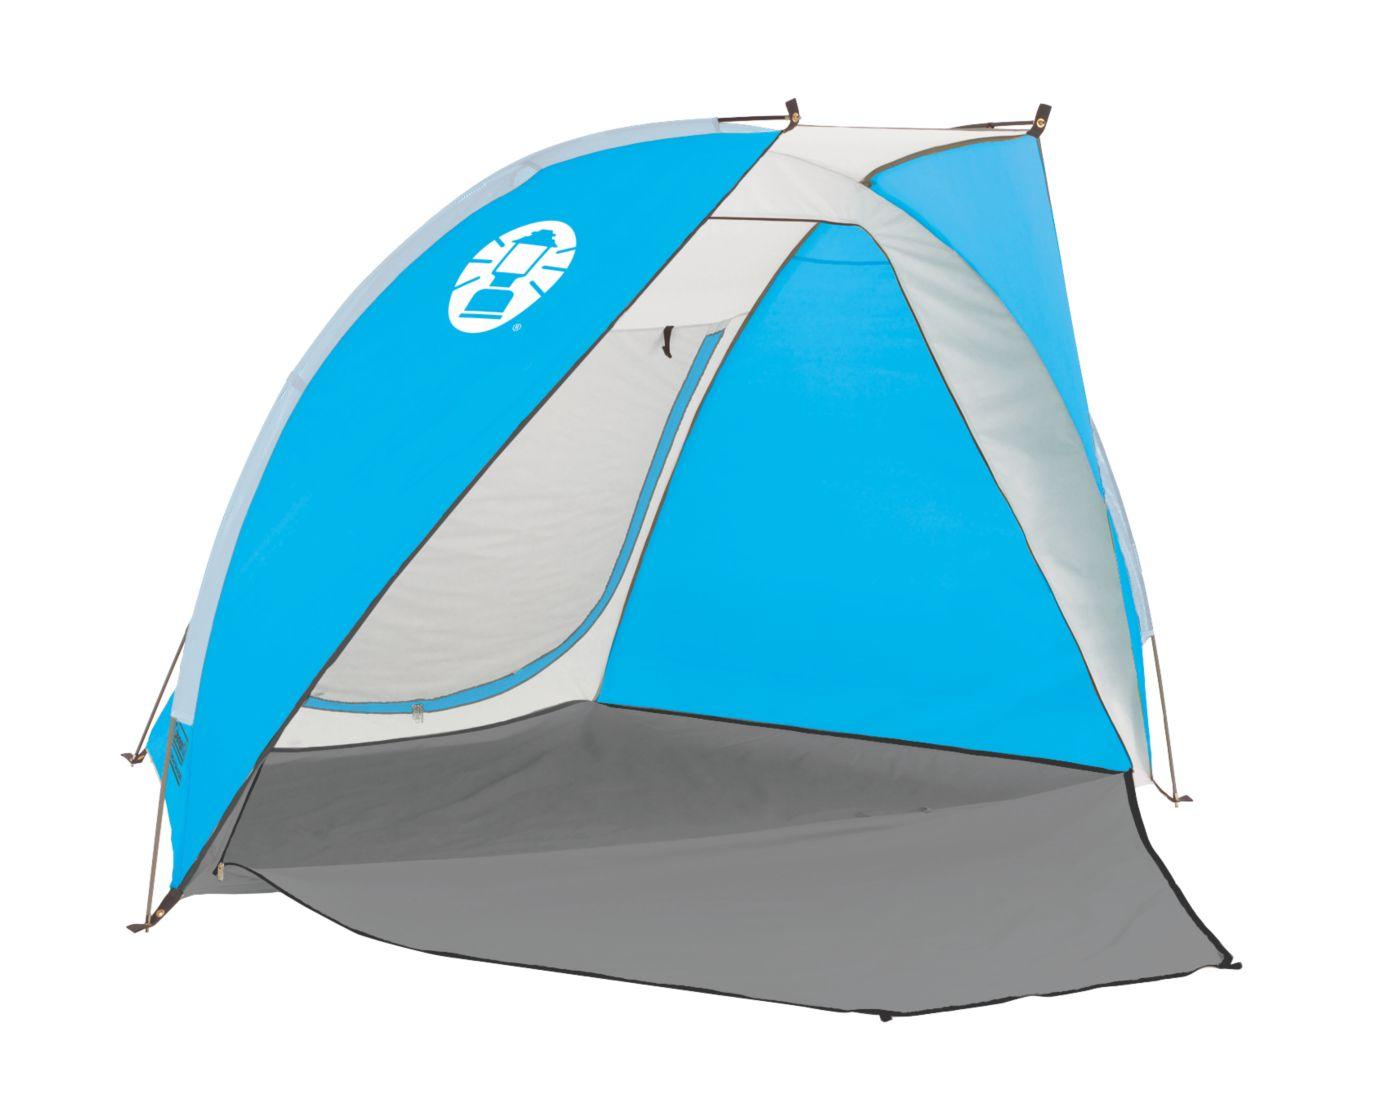 DayTripper Beach Shade Tents, Sun Shades \u0026 Shelters | Coleman